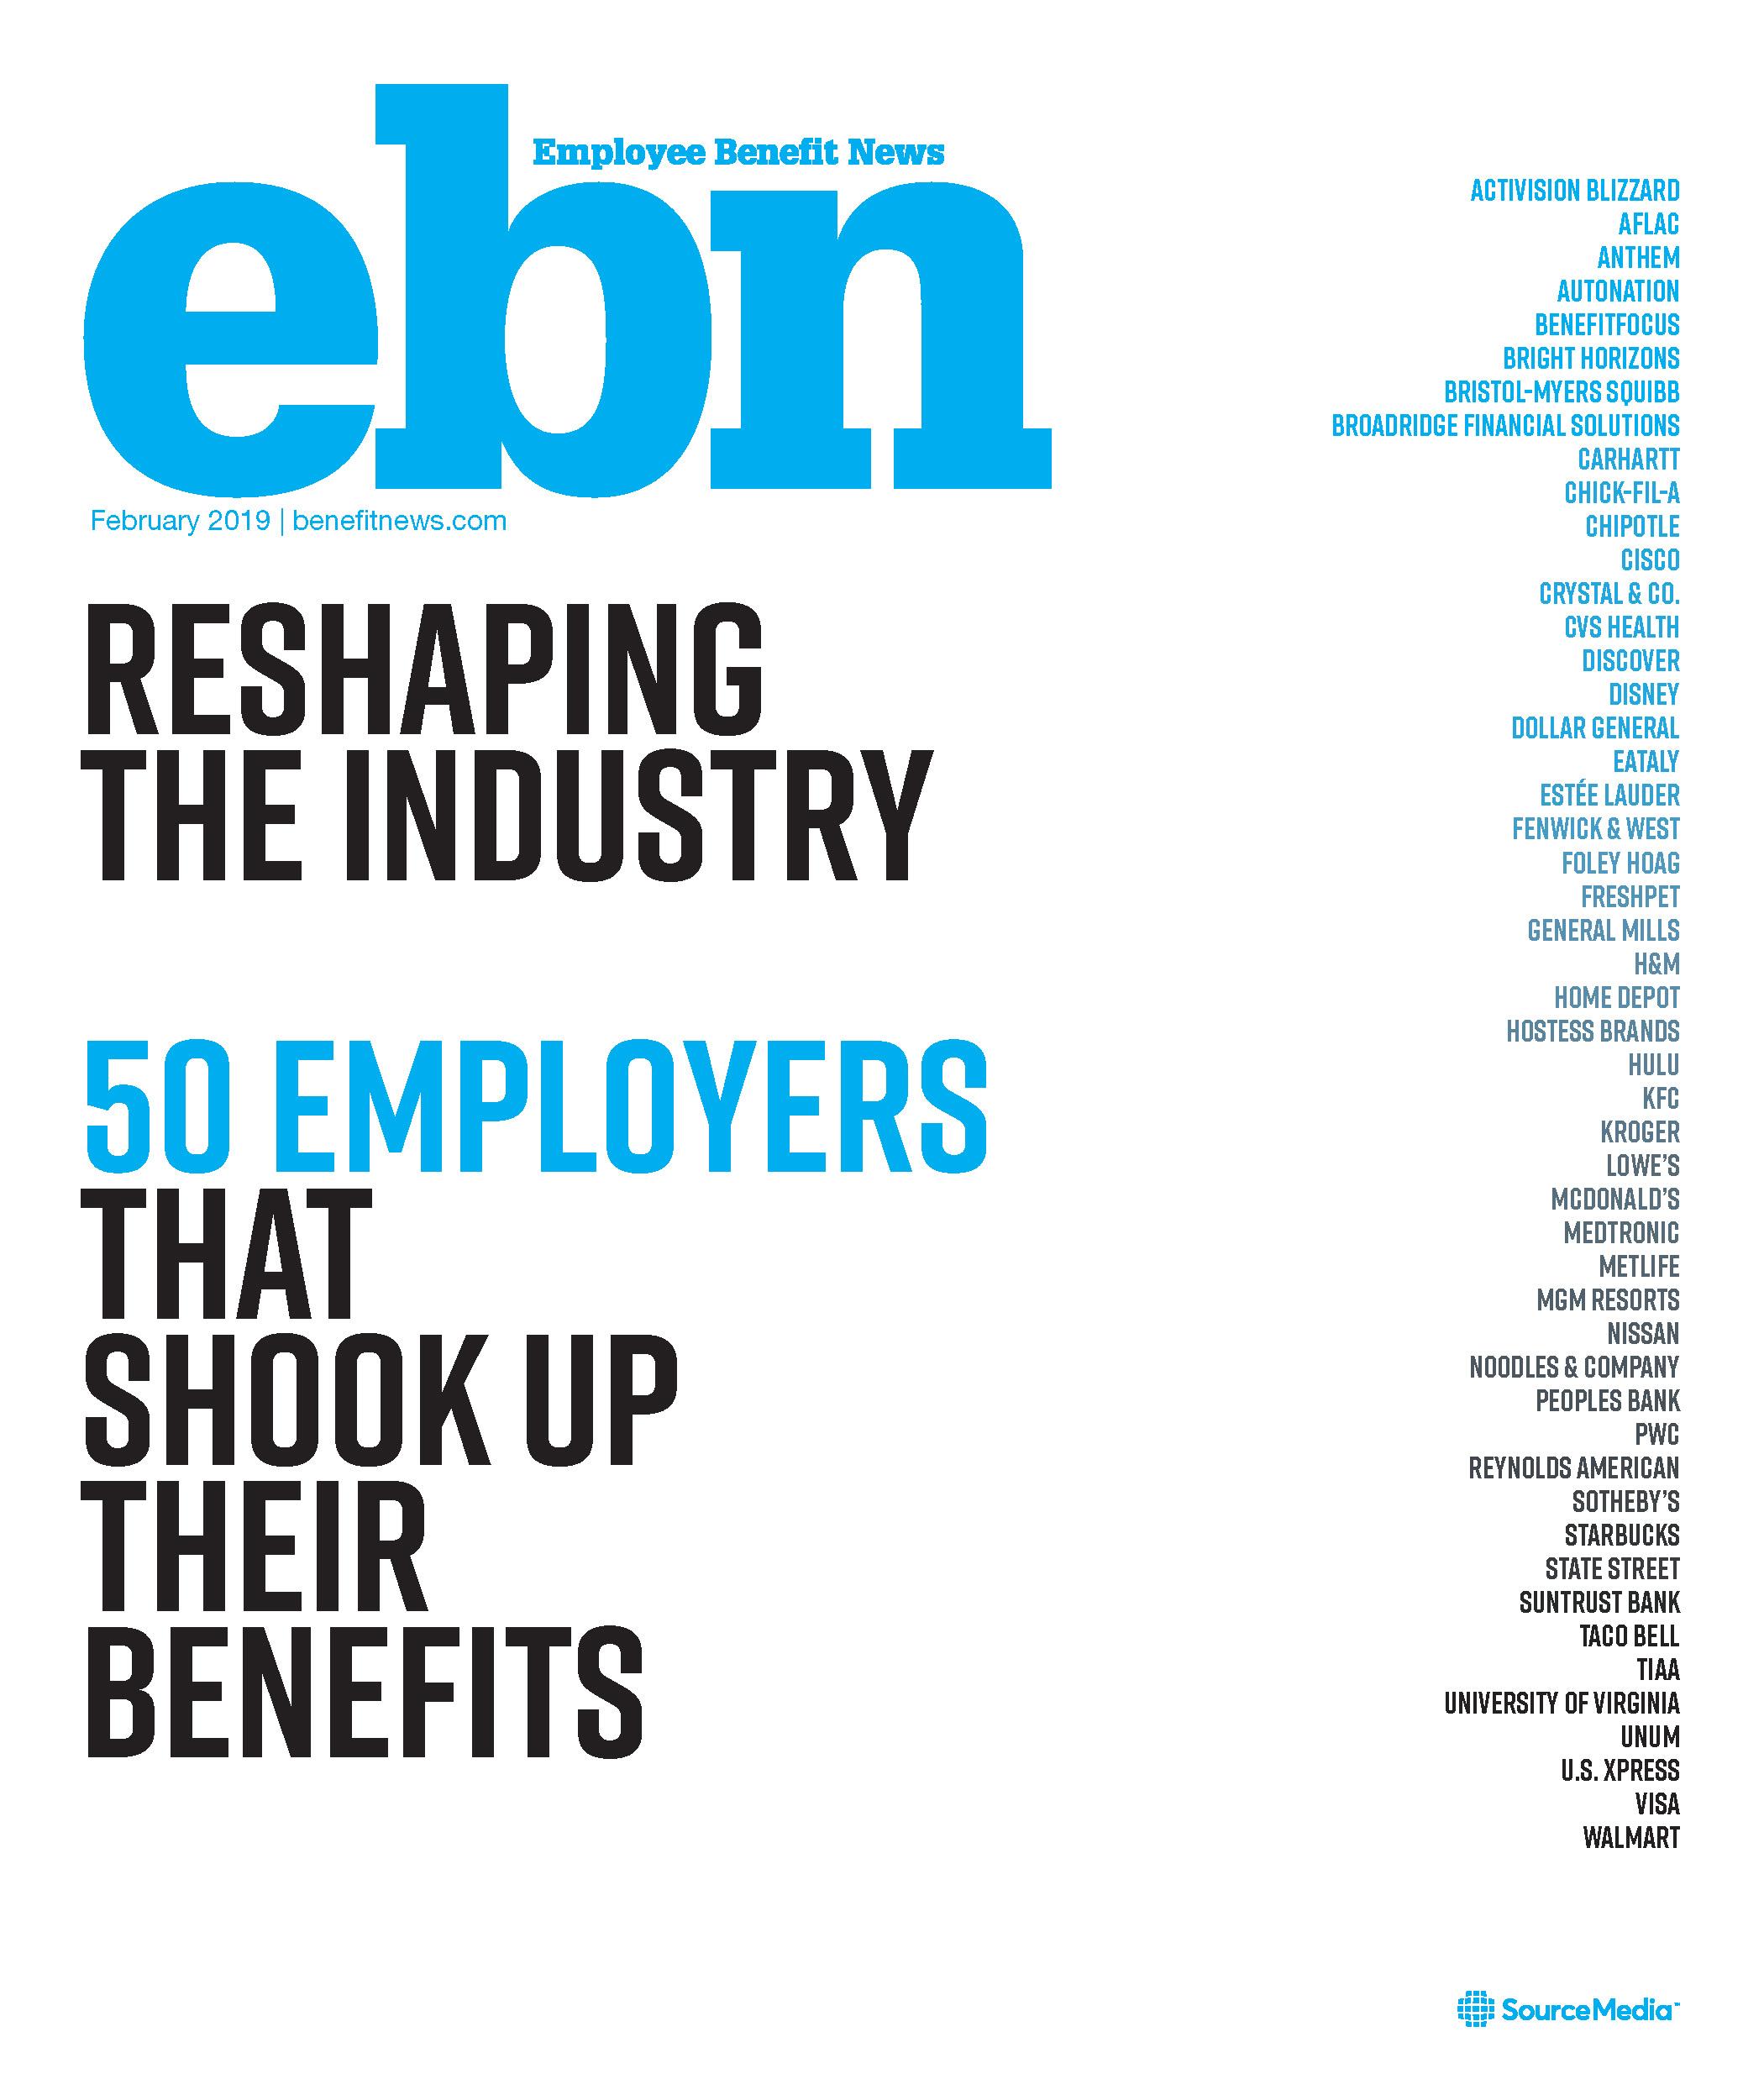 Employee Benefit News - February 2019 | Employee Benefit News